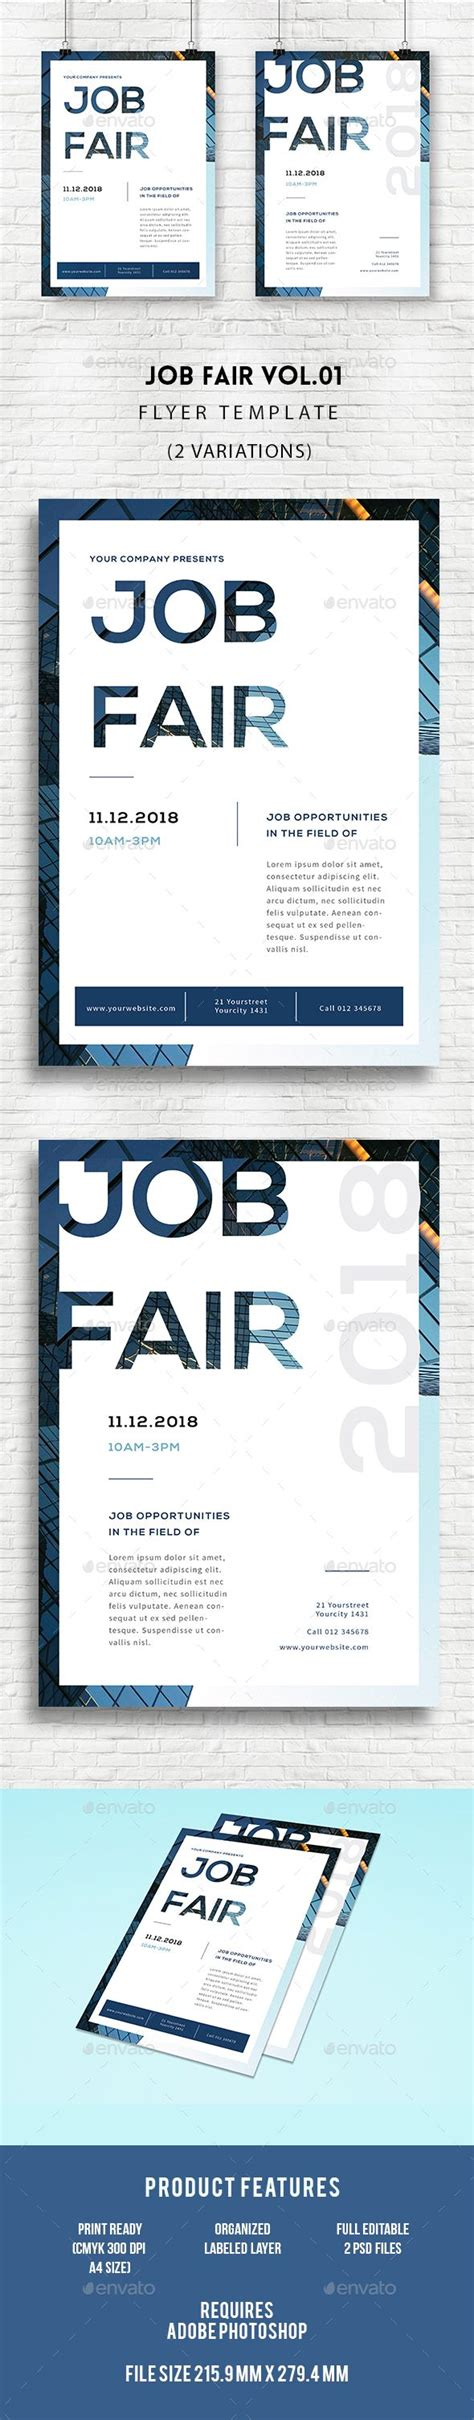 design event jobs job fair flyer type treatments design and event poster